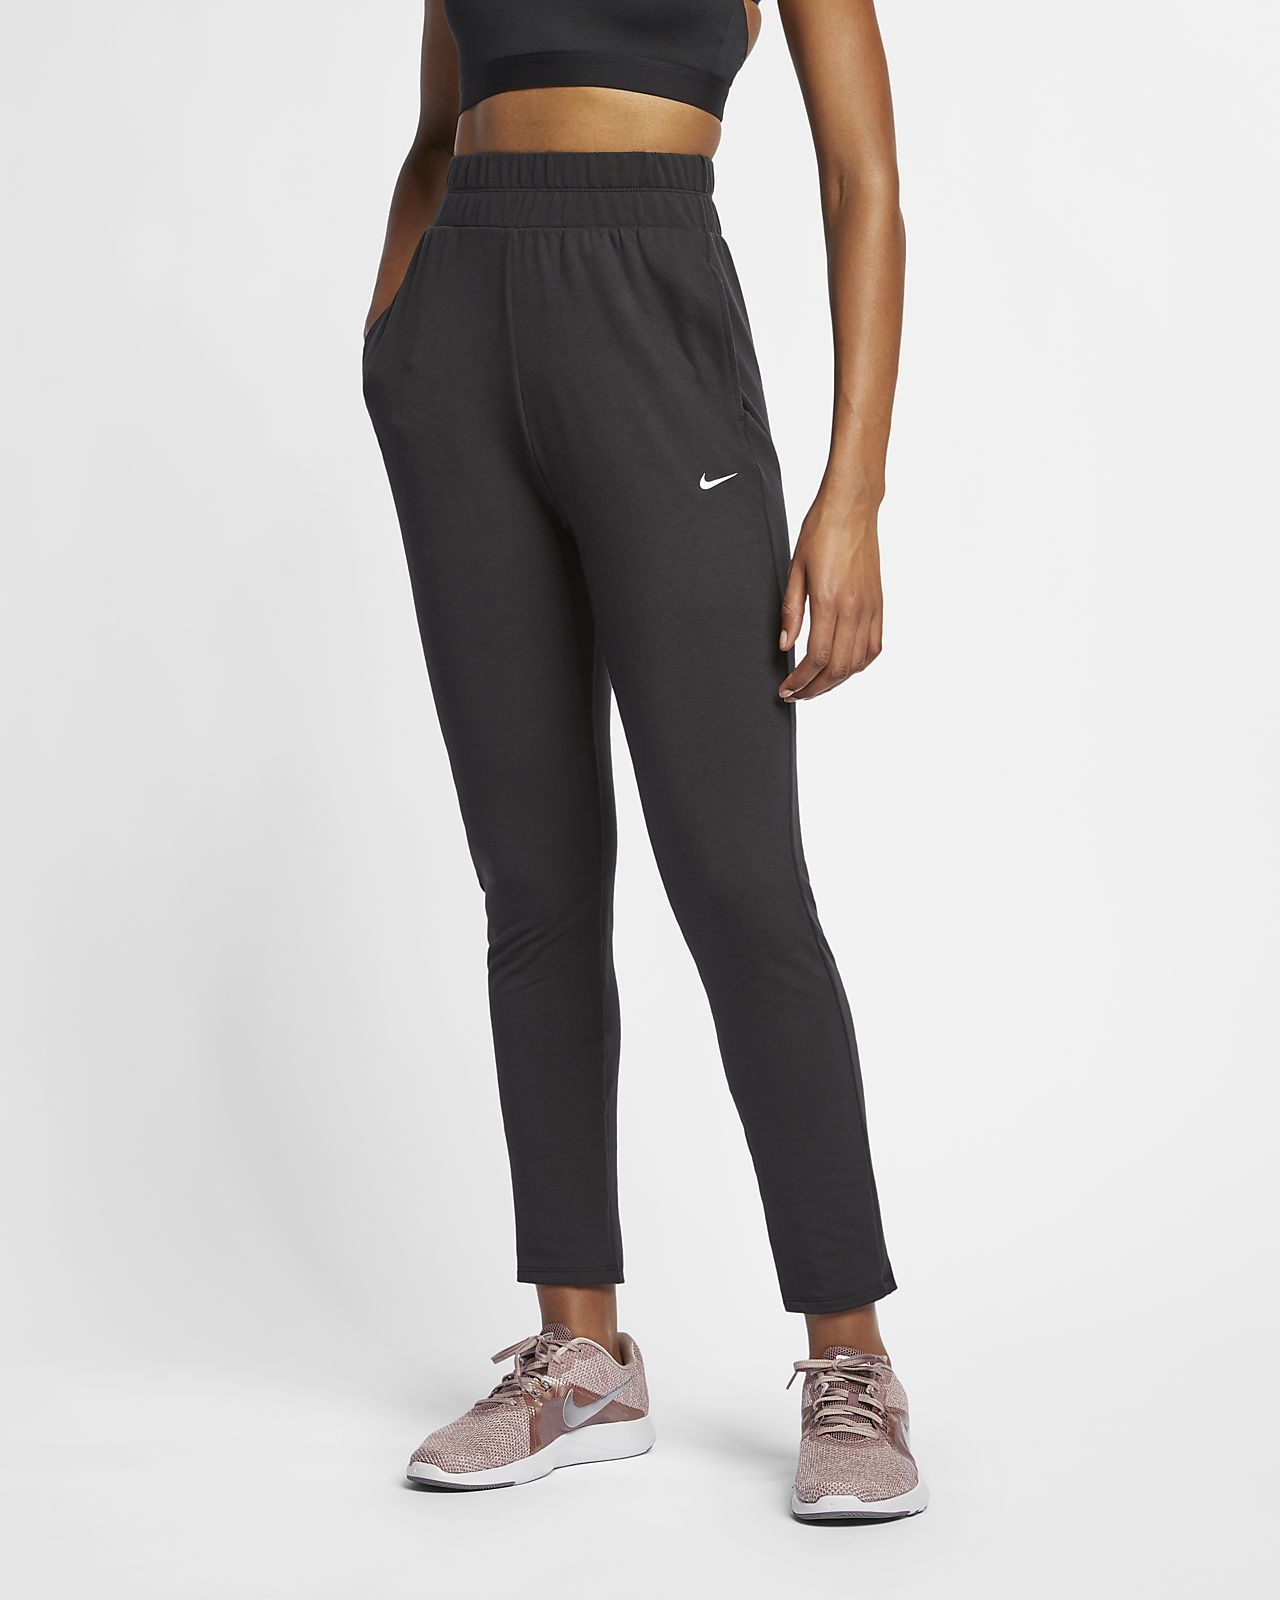 Nike Flow Damen-Trainingshose